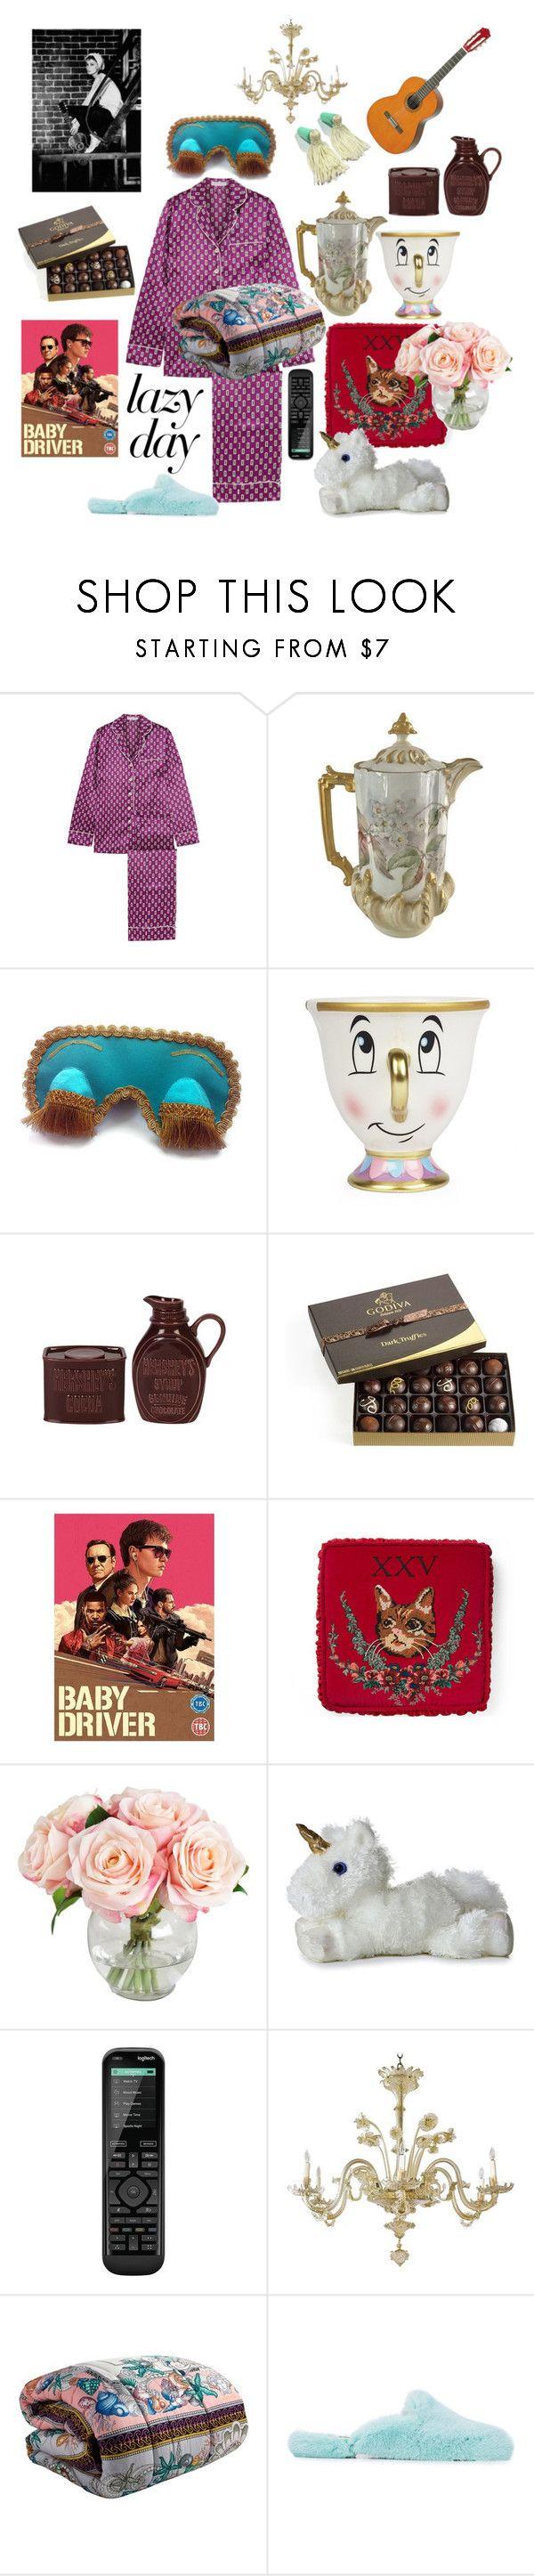 """lazy day"" by cocoshampoo ❤ liked on Polyvore featuring Olivia von Halle, POSH, Tiffany & Co., Disney, Fitz & Floyd, Godiva, Gucci, Logitech, Versace and Natasha Zinko"